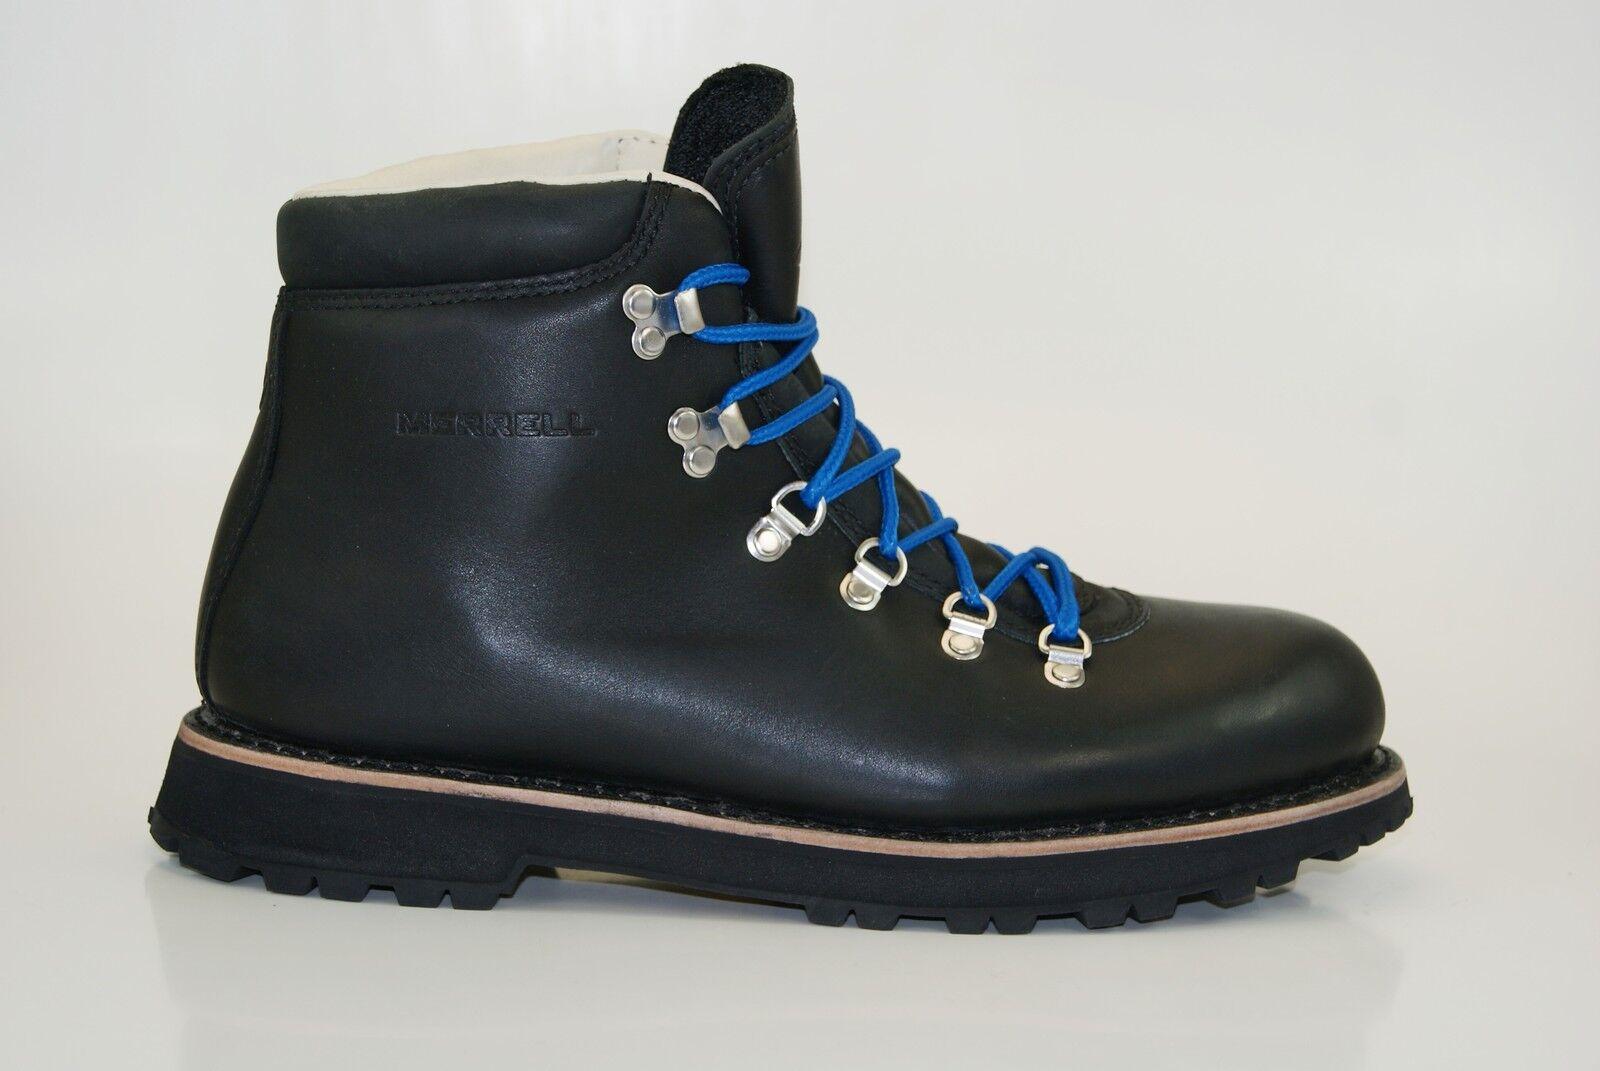 Merrell Wilderness Canyon Boots Uomo Scarponi Scarponcini Scarpe Uomo Boots j15301 e82d02